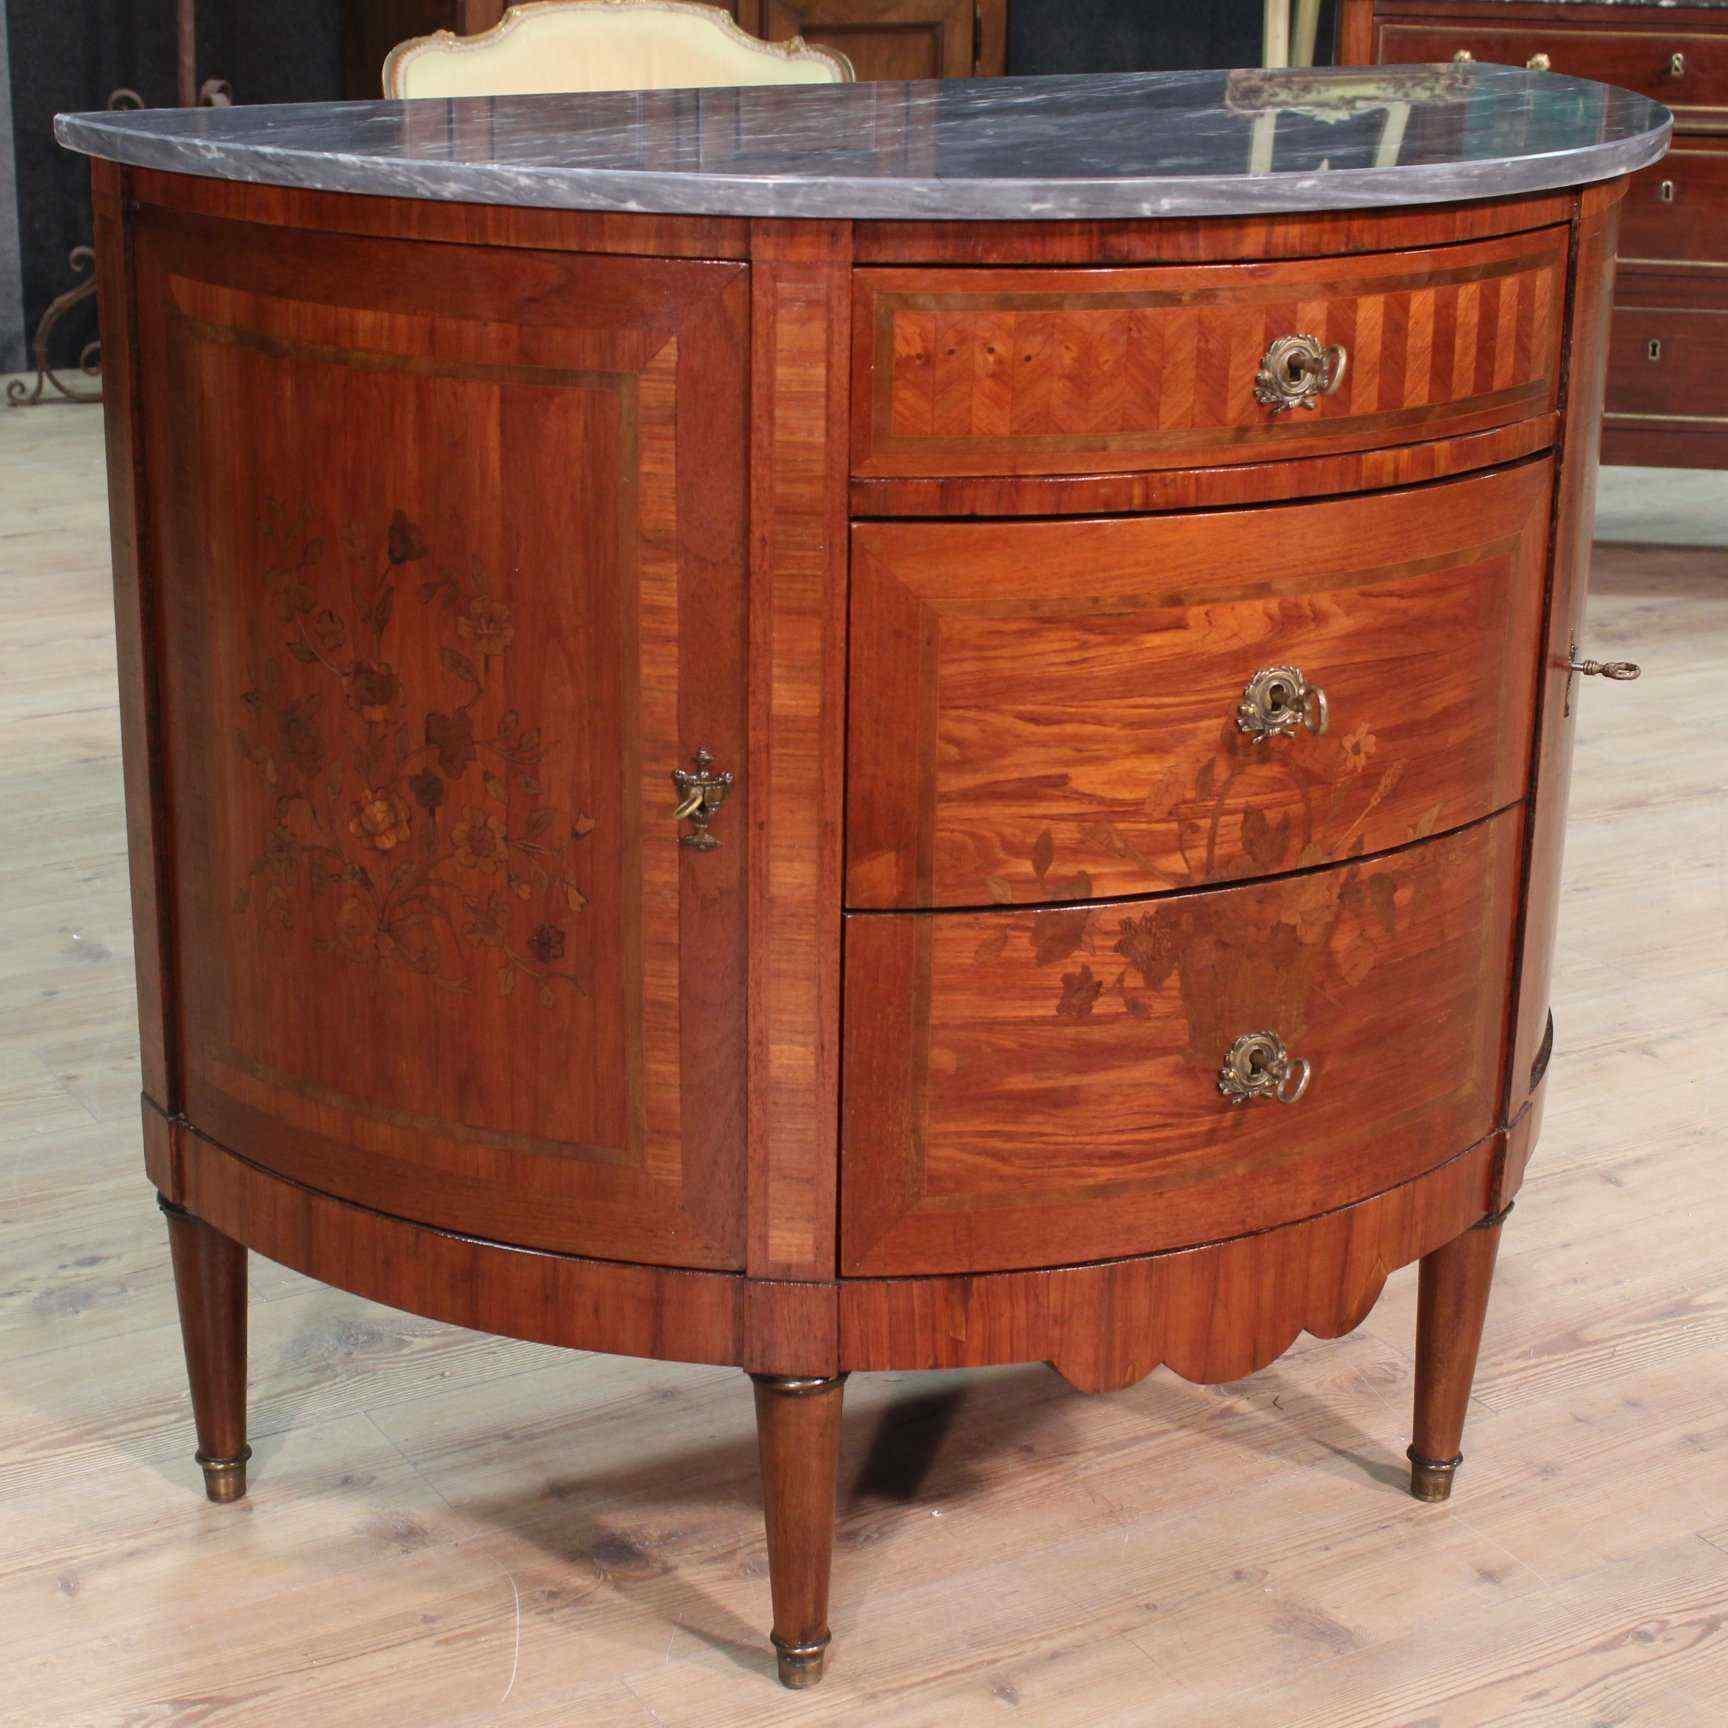 Dresser commode demi-lune, France, XIX century